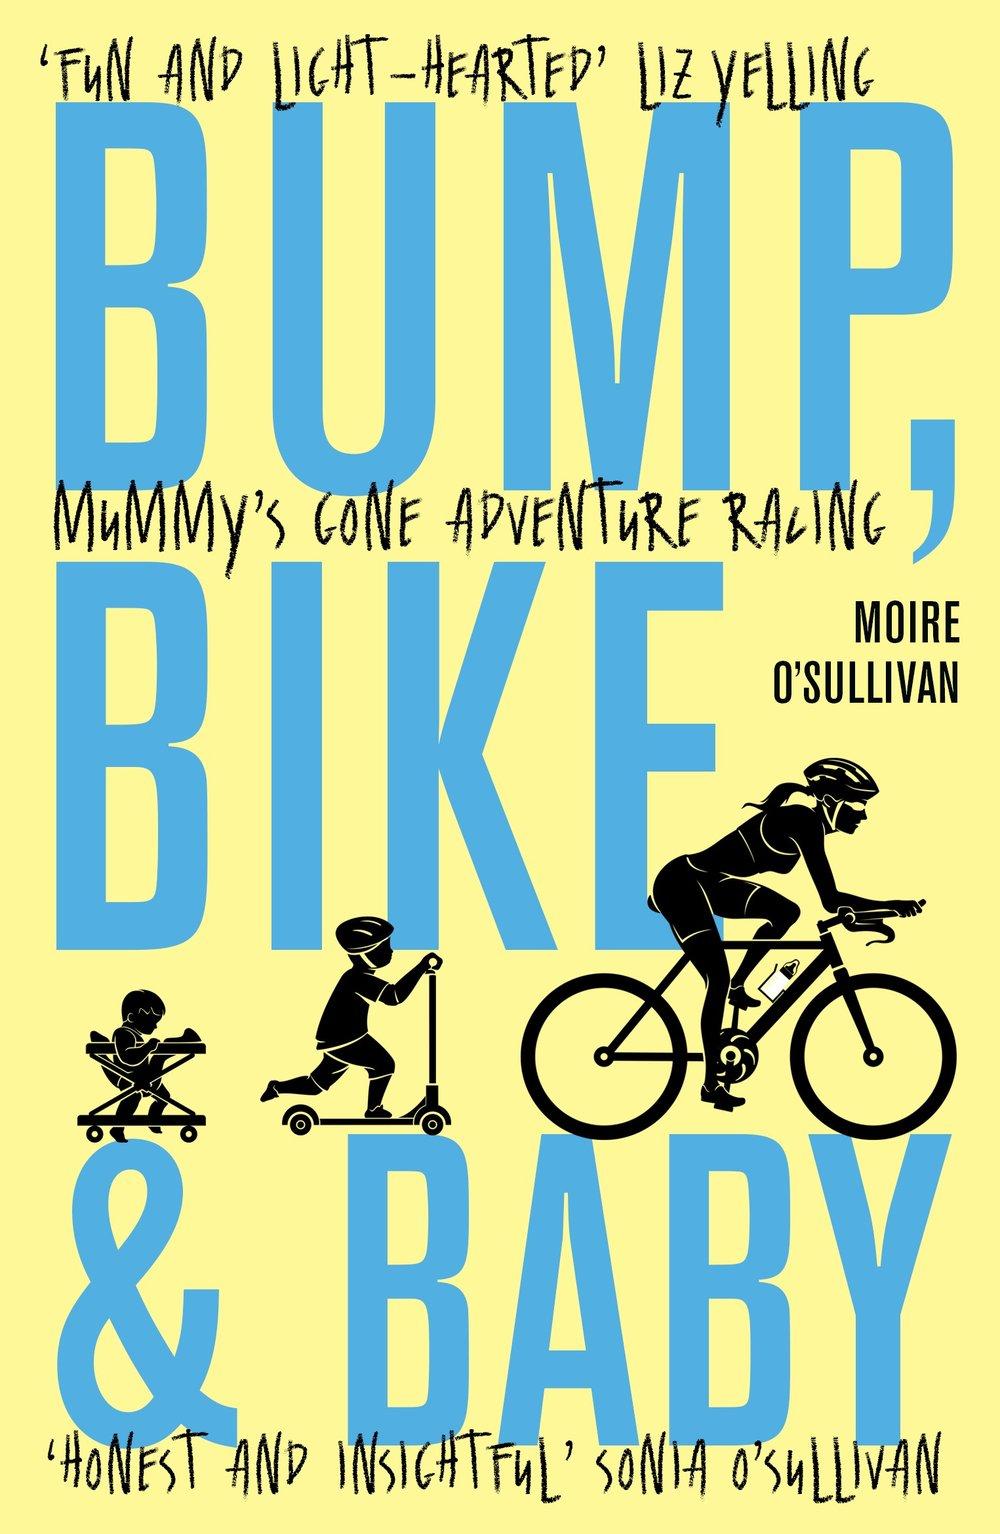 Bump, Bike and Baby cover image.jpg